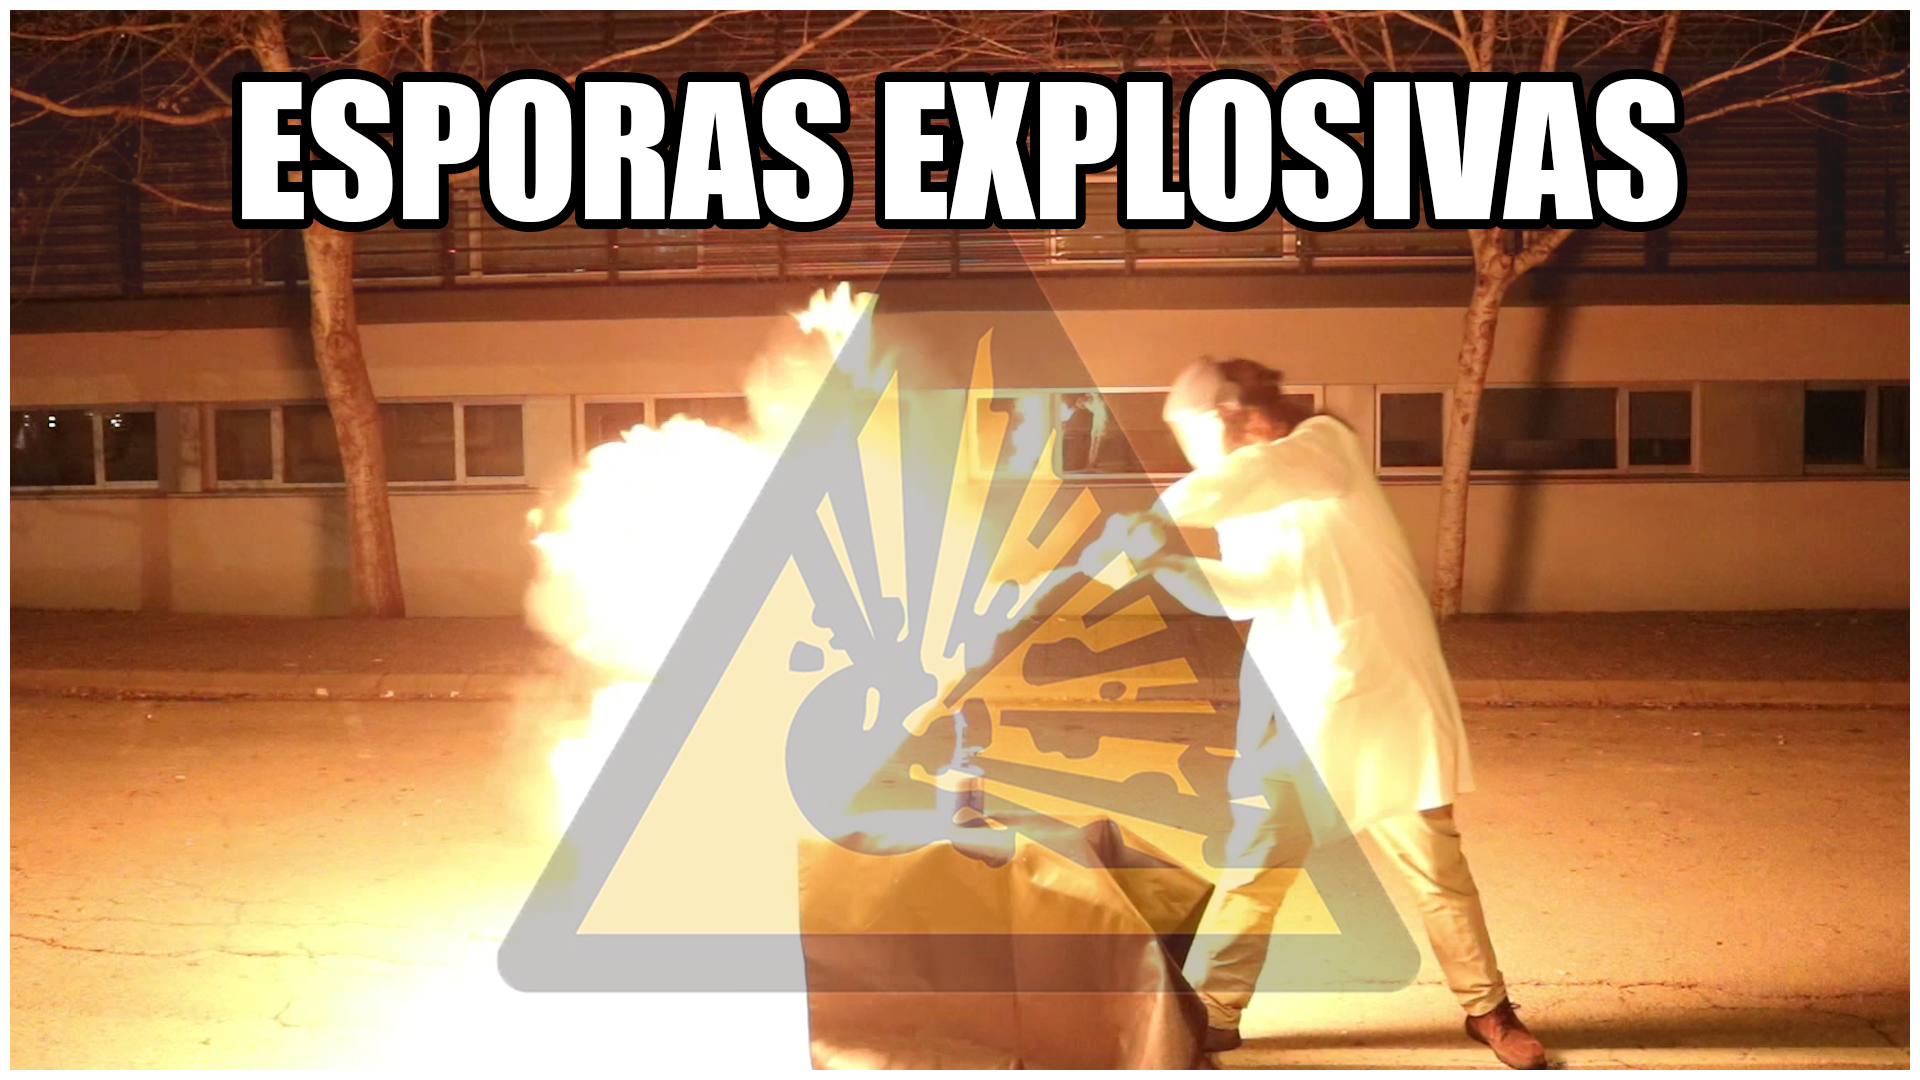 Portada Esporas Explosivas